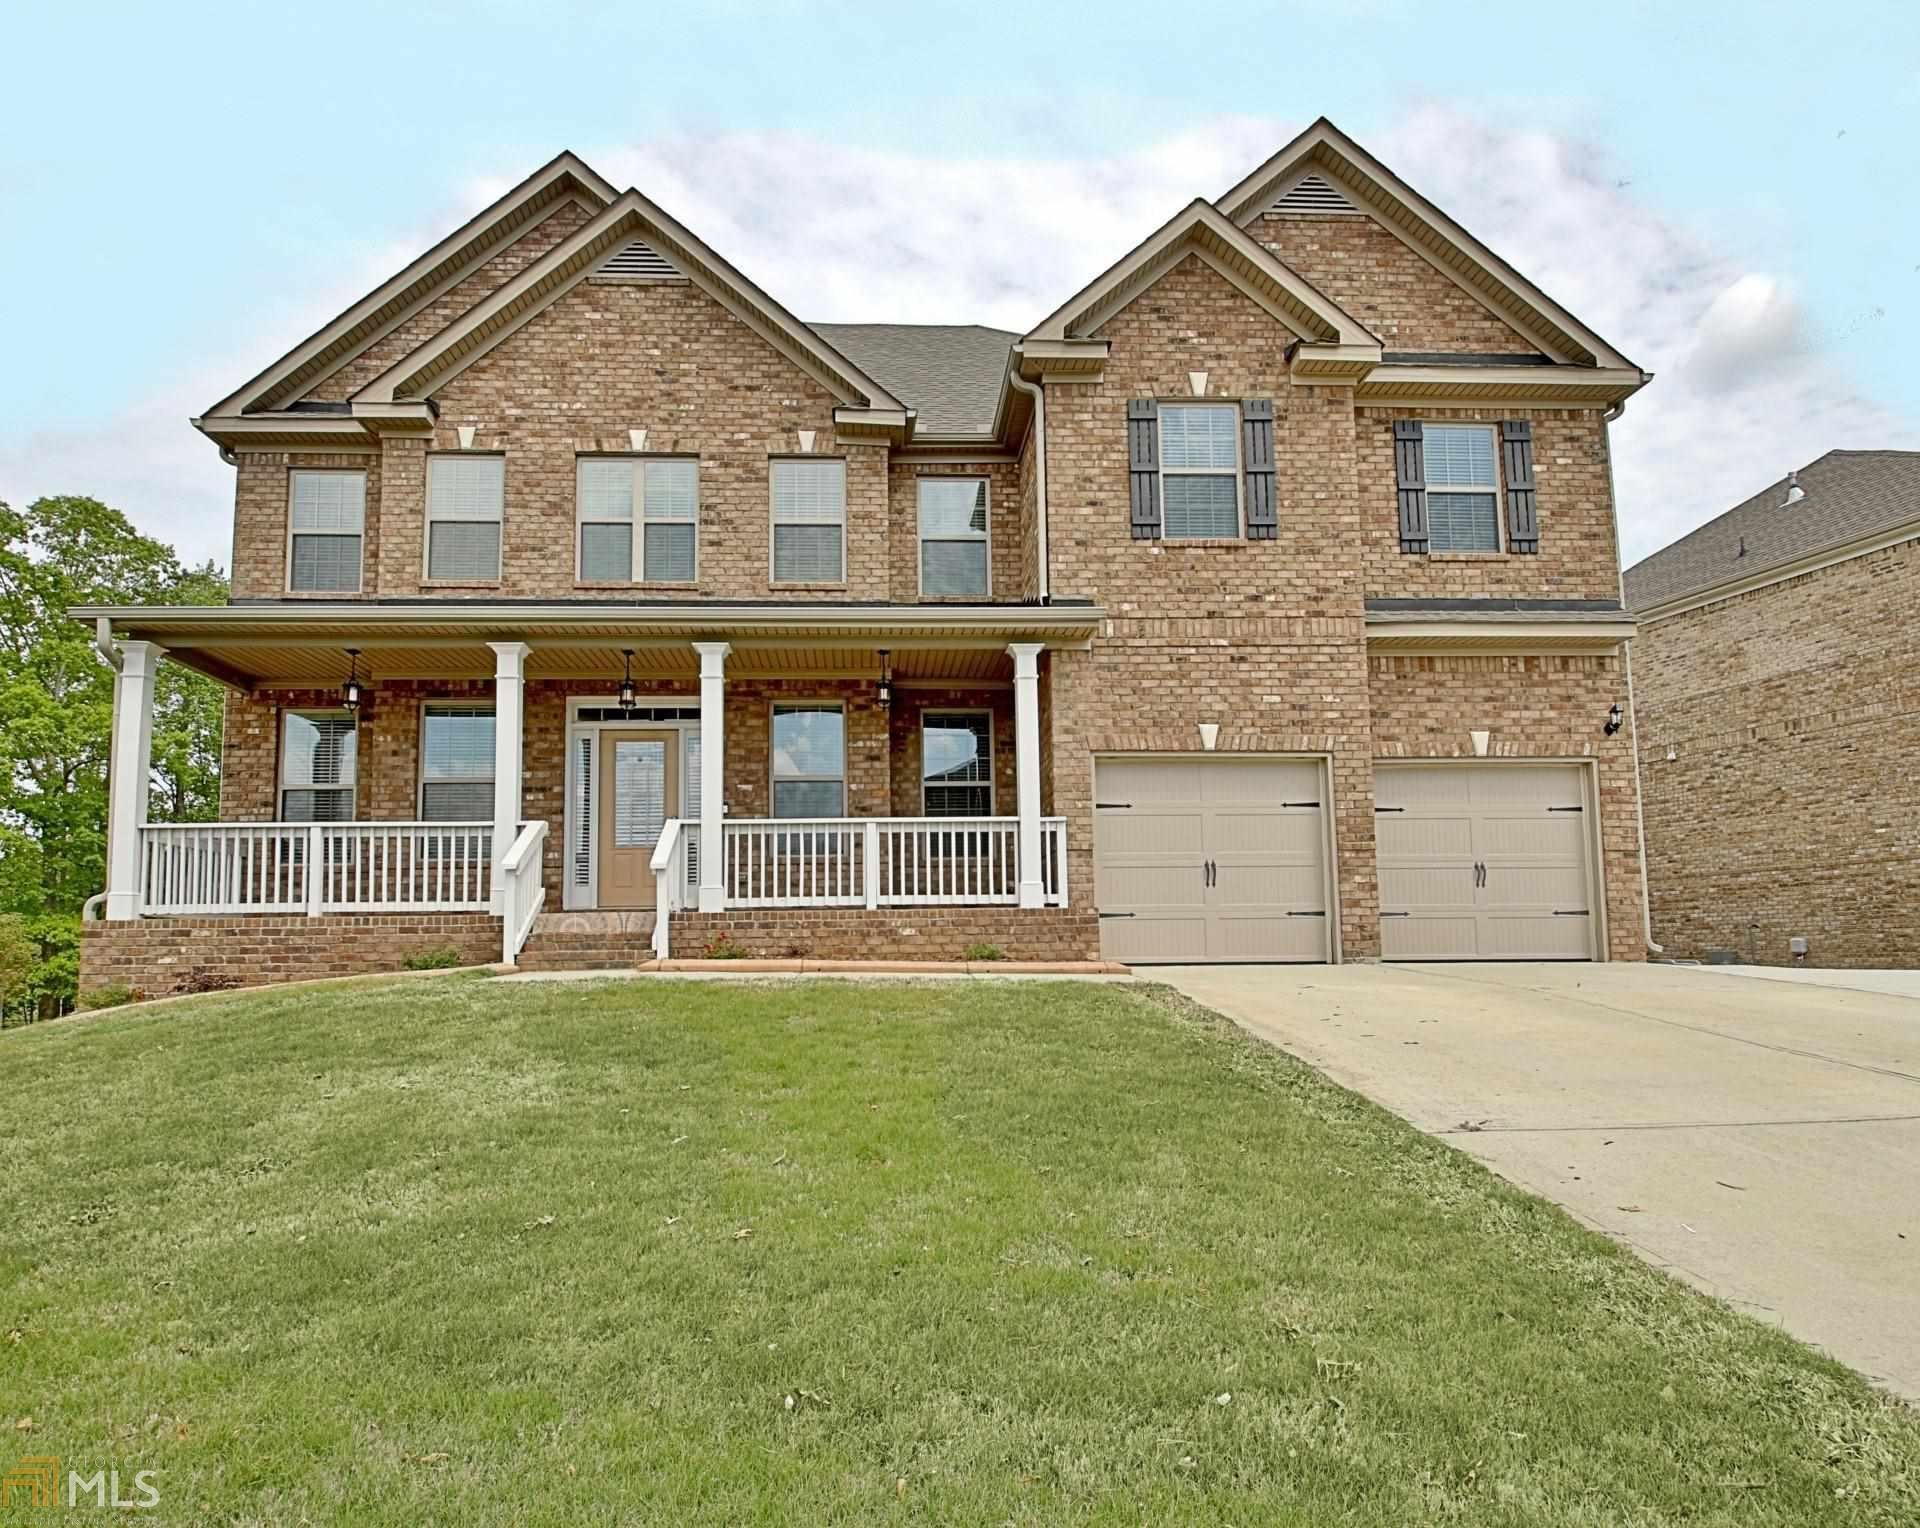 550 Sawgrass, Fairburn, GA 30213 - #: 8972155